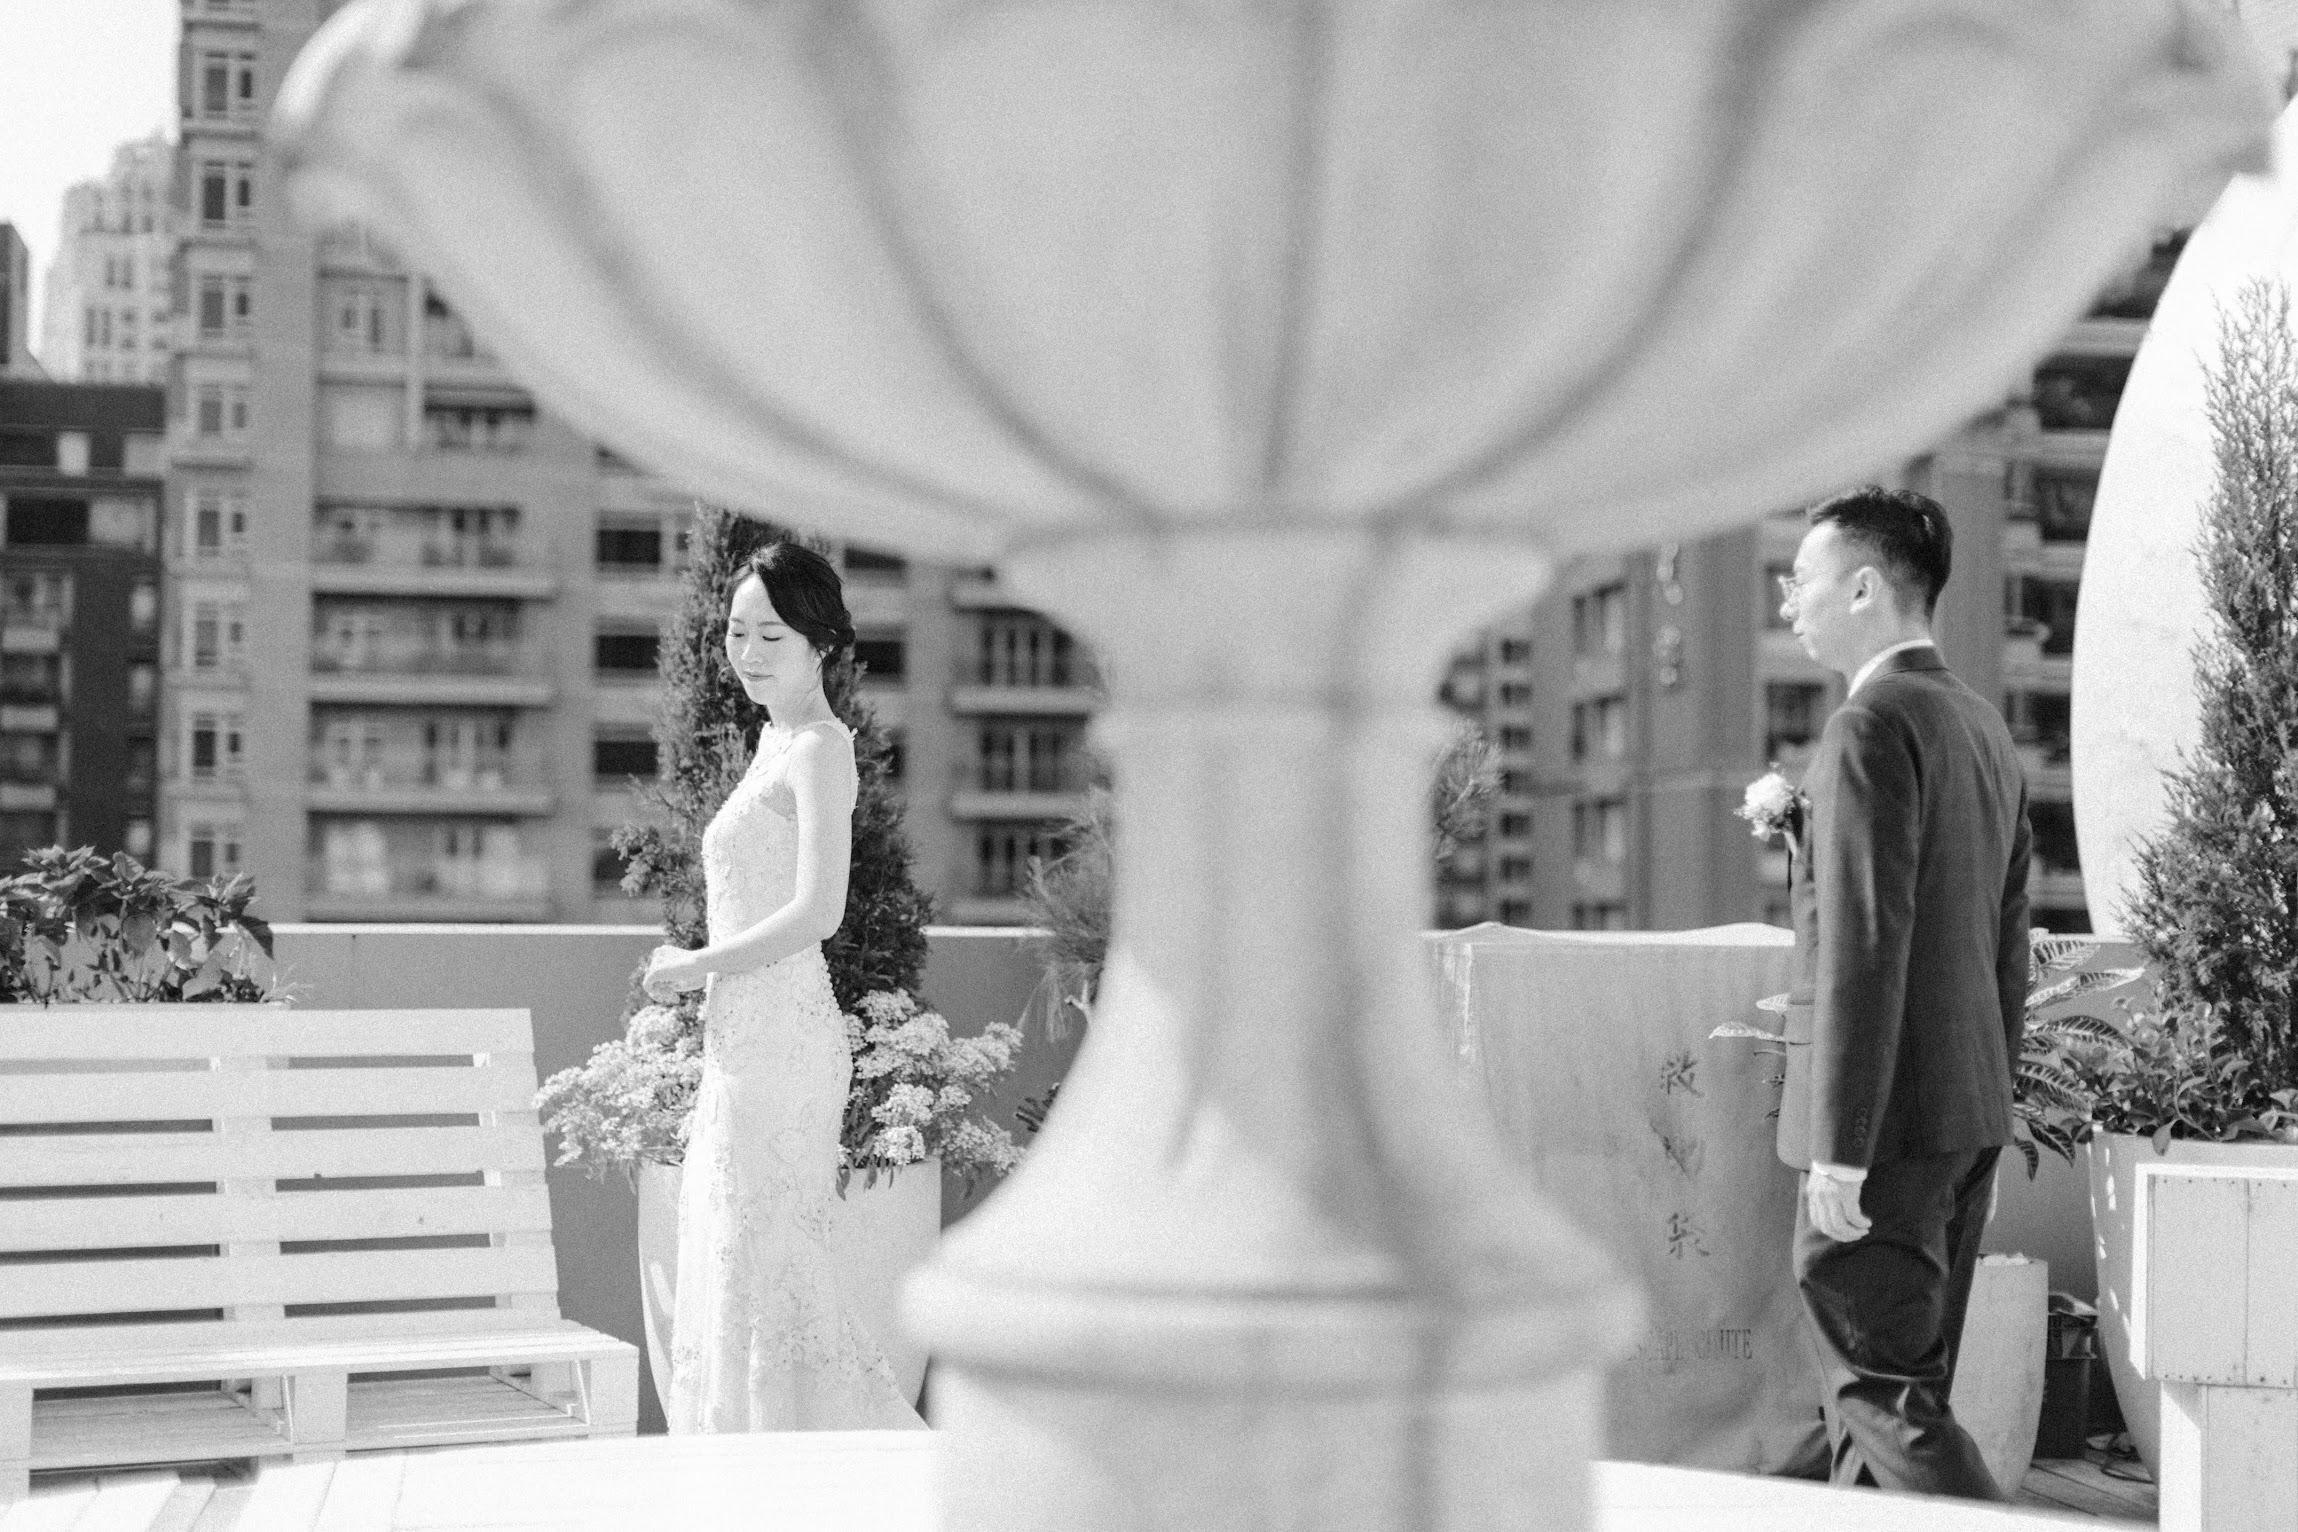 VVG FOOD PLAY 婚禮, VVG婚宴, VVG 婚禮,AG婚攝,美式婚禮,台中歌劇院婚禮,Amazing Grace婚攝